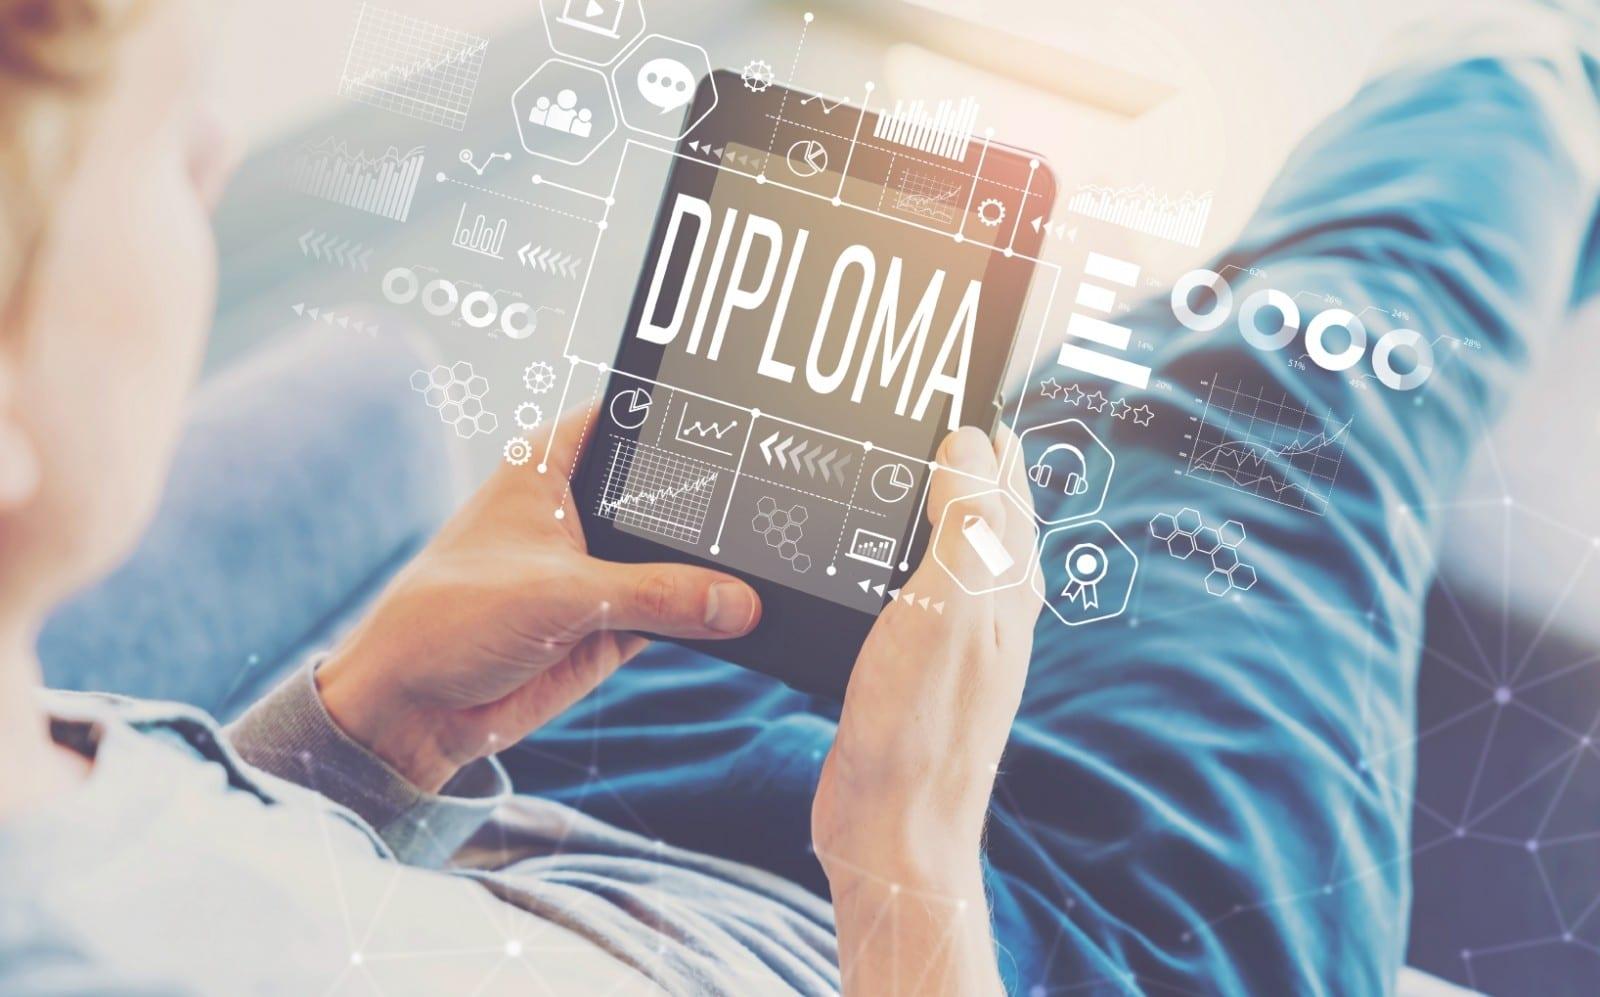 TESOL Diploma - Get Certified Online